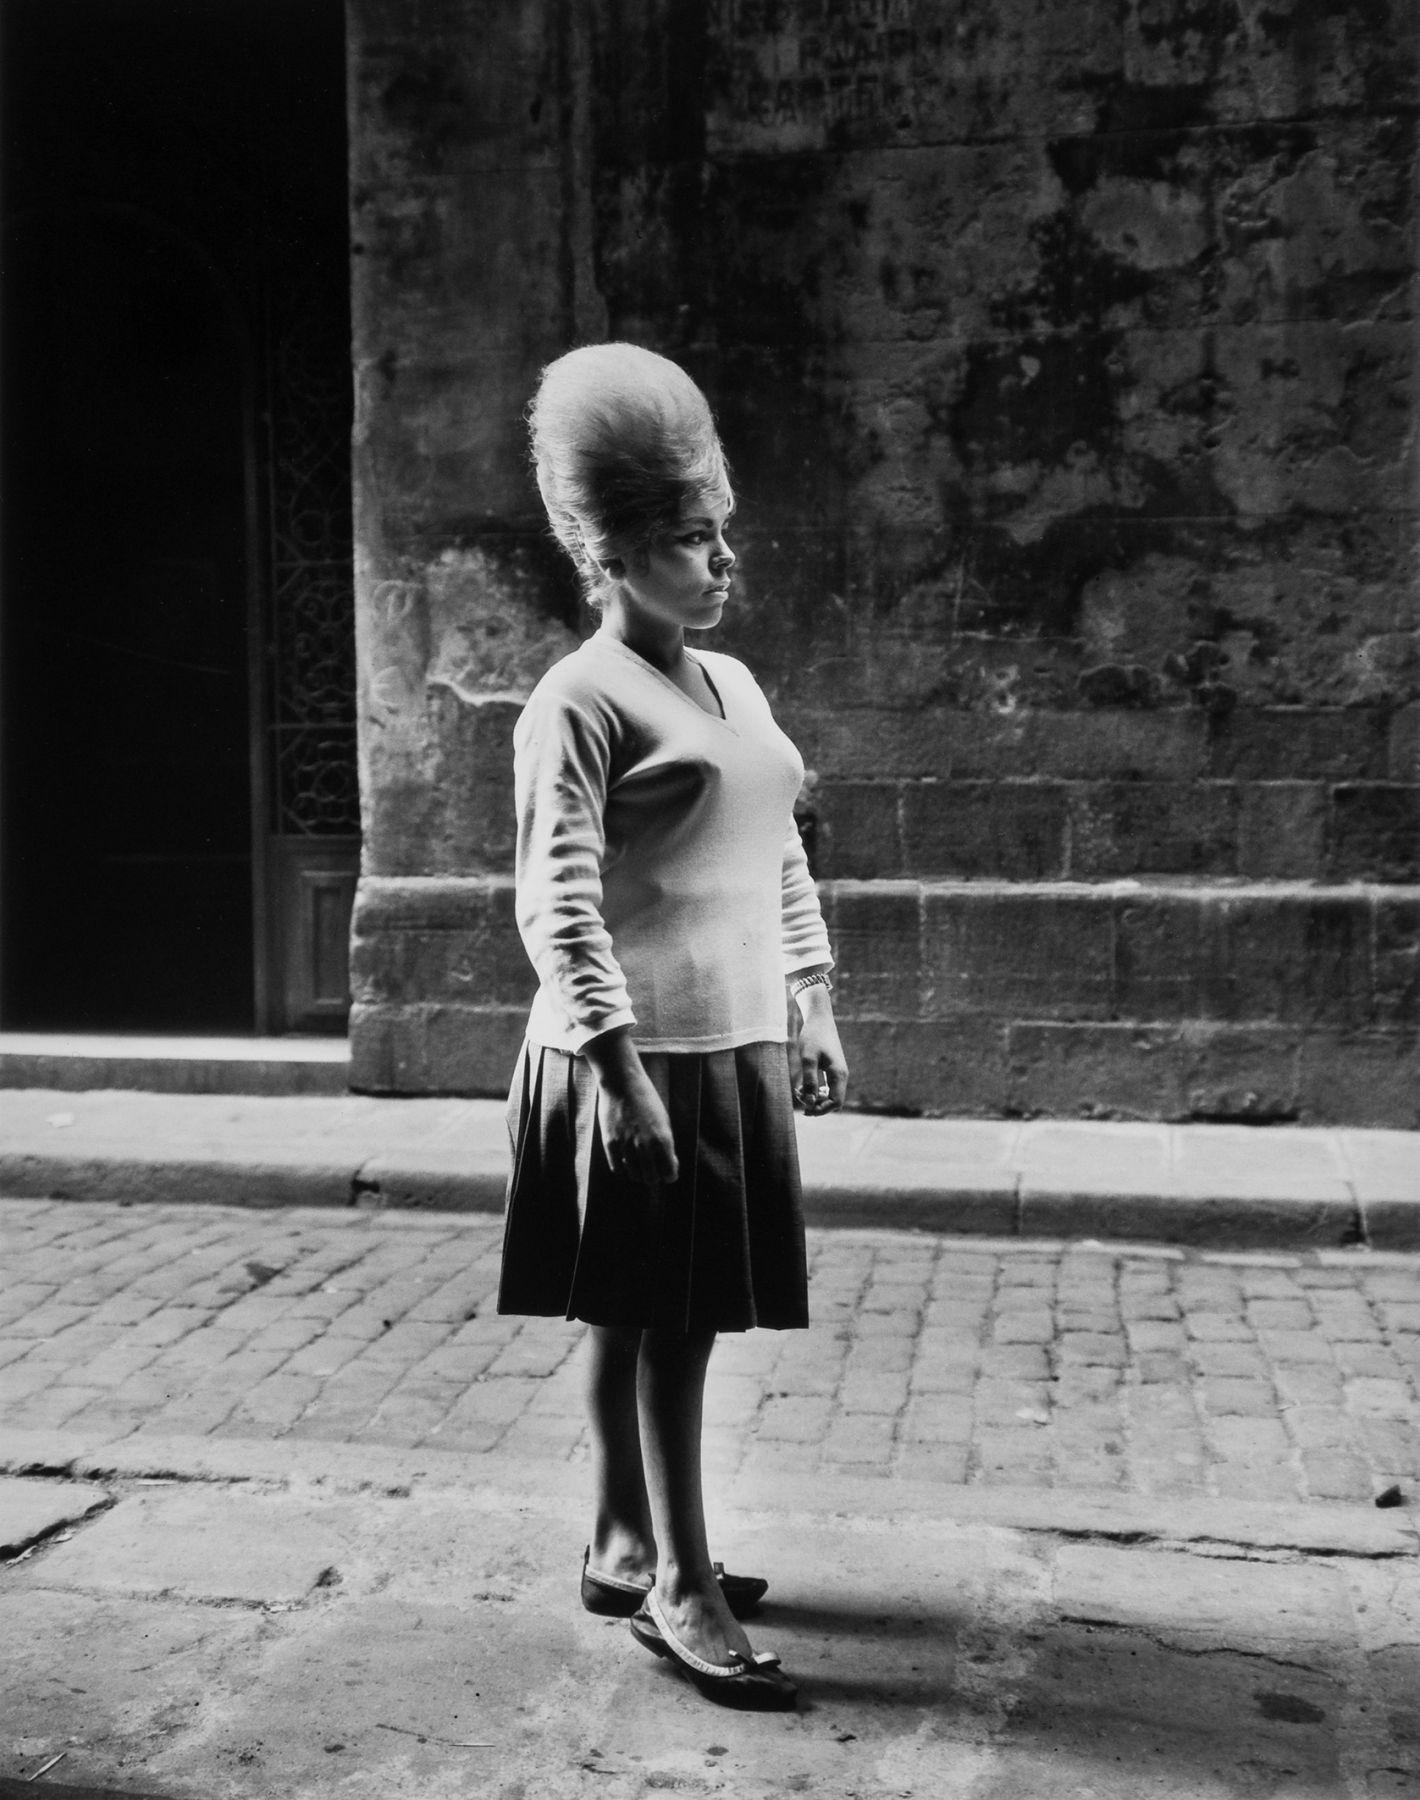 Girl, Barcelona.1963, 20 x 16 inch gelatin silver print